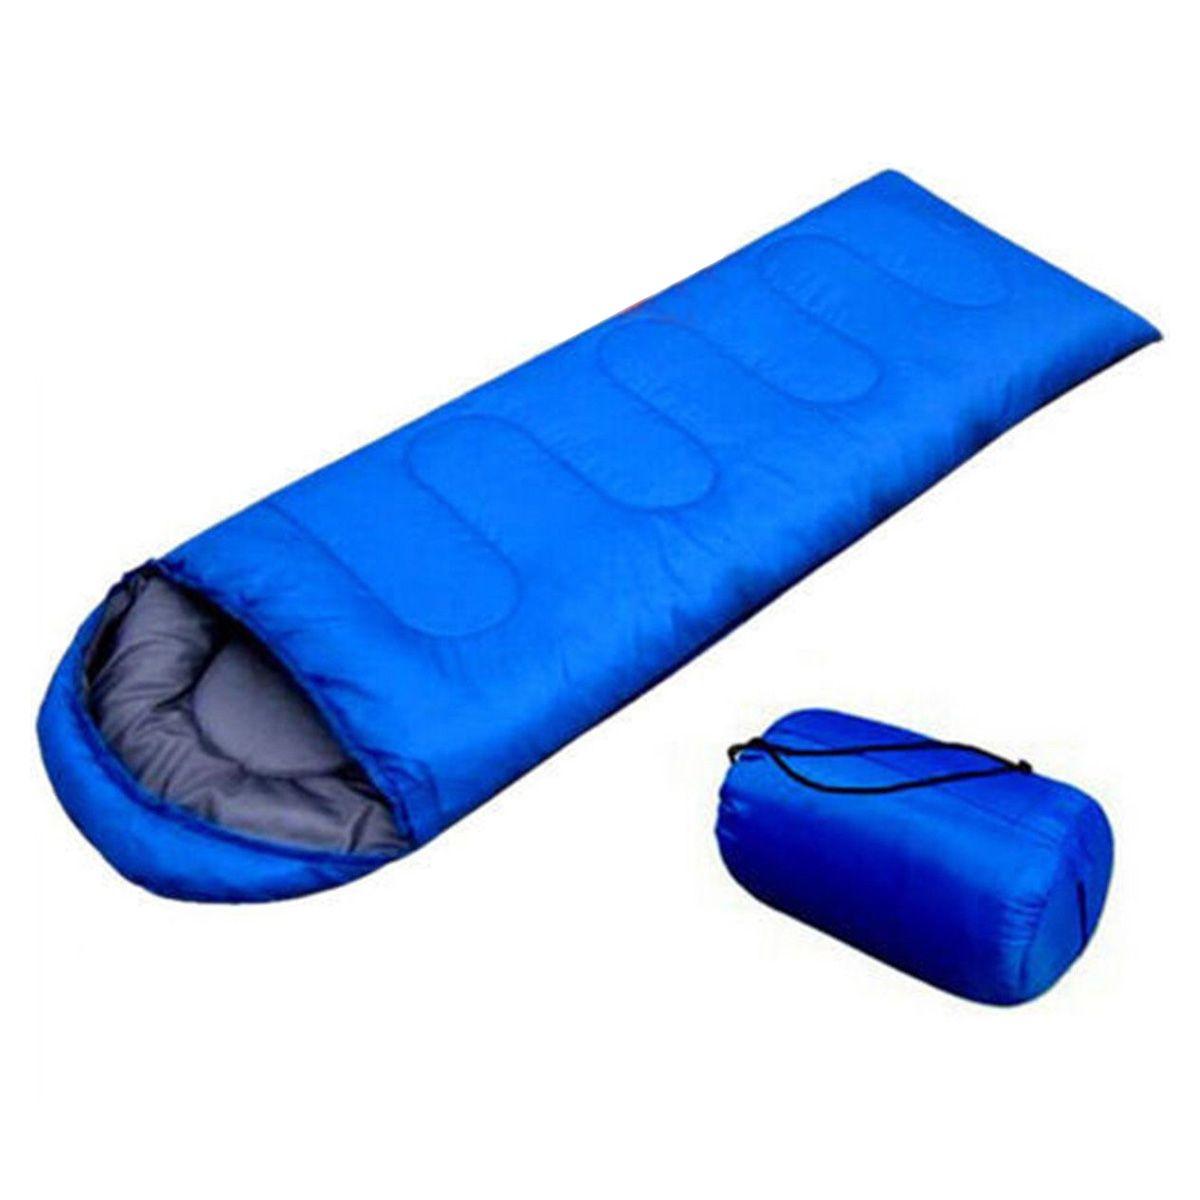 Al por mayor- JHO-Outdoor Impermeable Sobre de viaje Saco de dormir Camping Senderismo Funda de transporte Azul